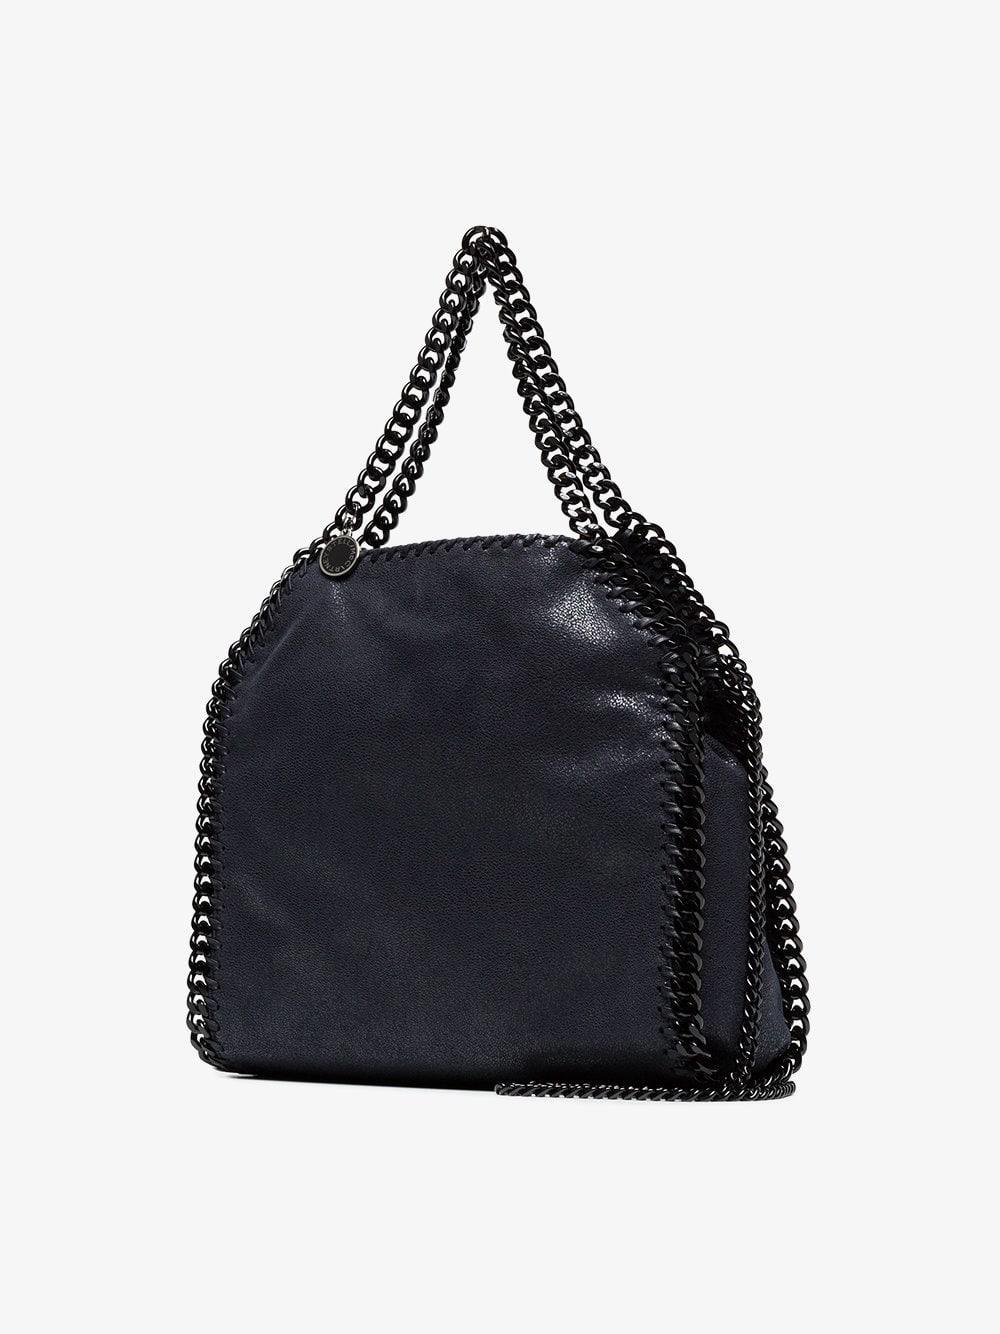 Stella Mccartney Navy Blue Falabella Mini Shoulder Bag in Blue - Lyst 9e92fb3f22a8e